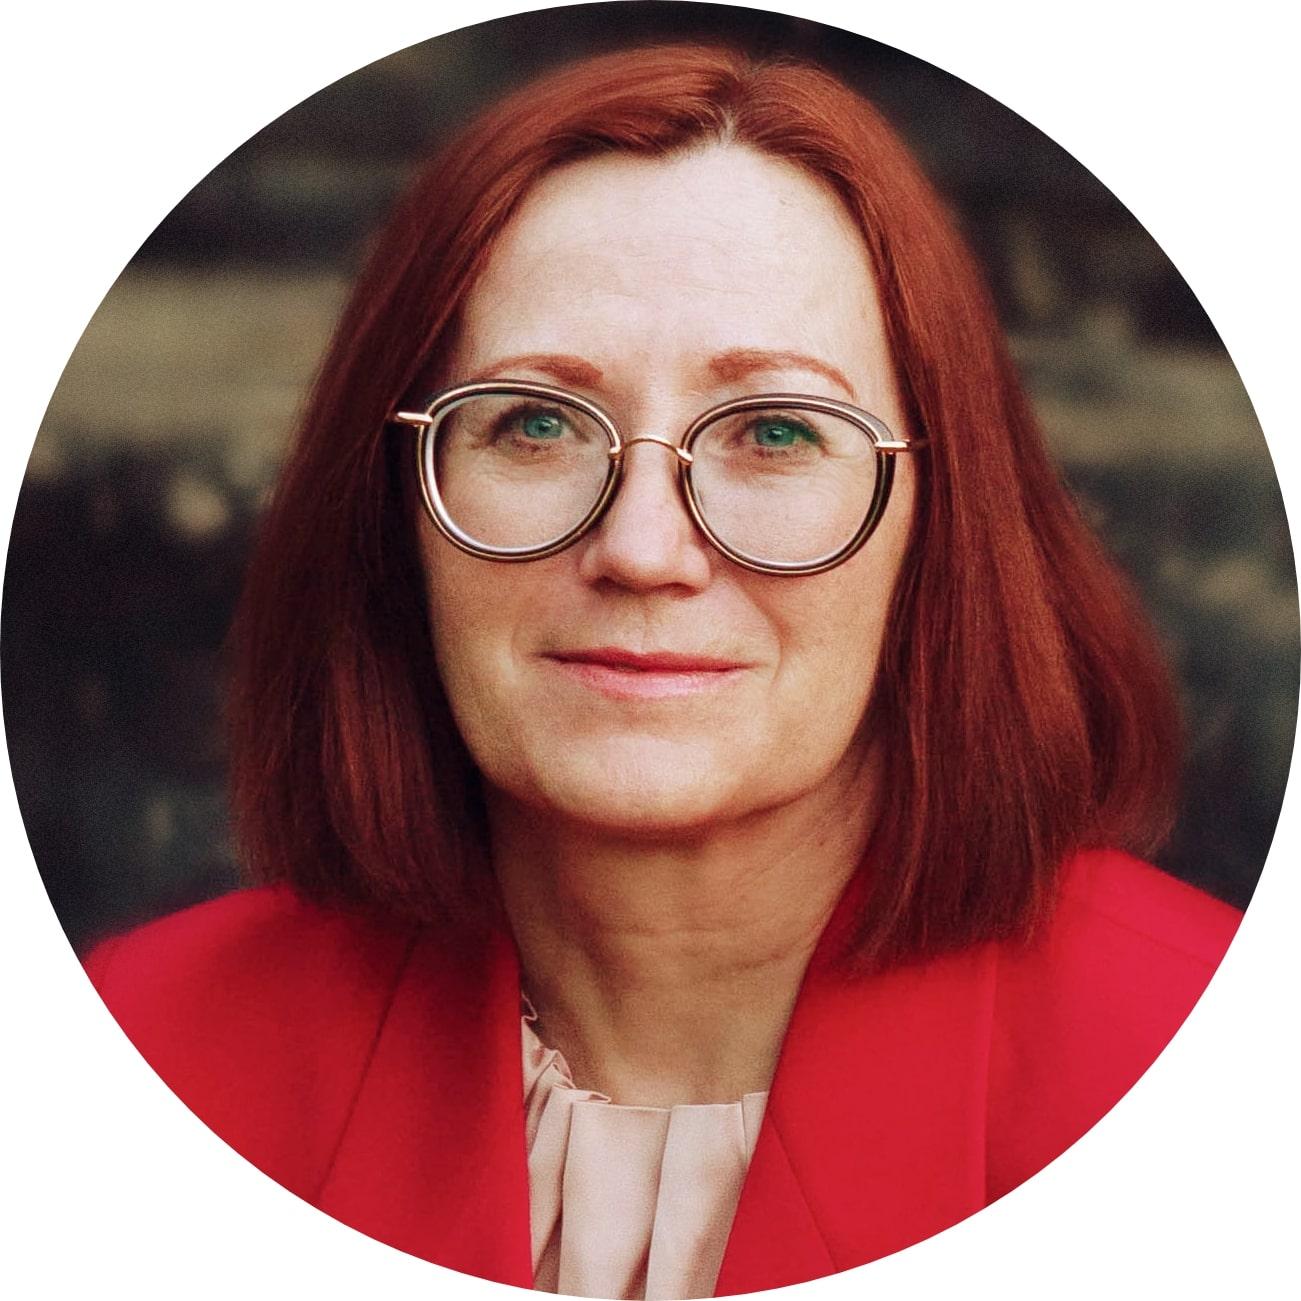 Susanna G., 41 years